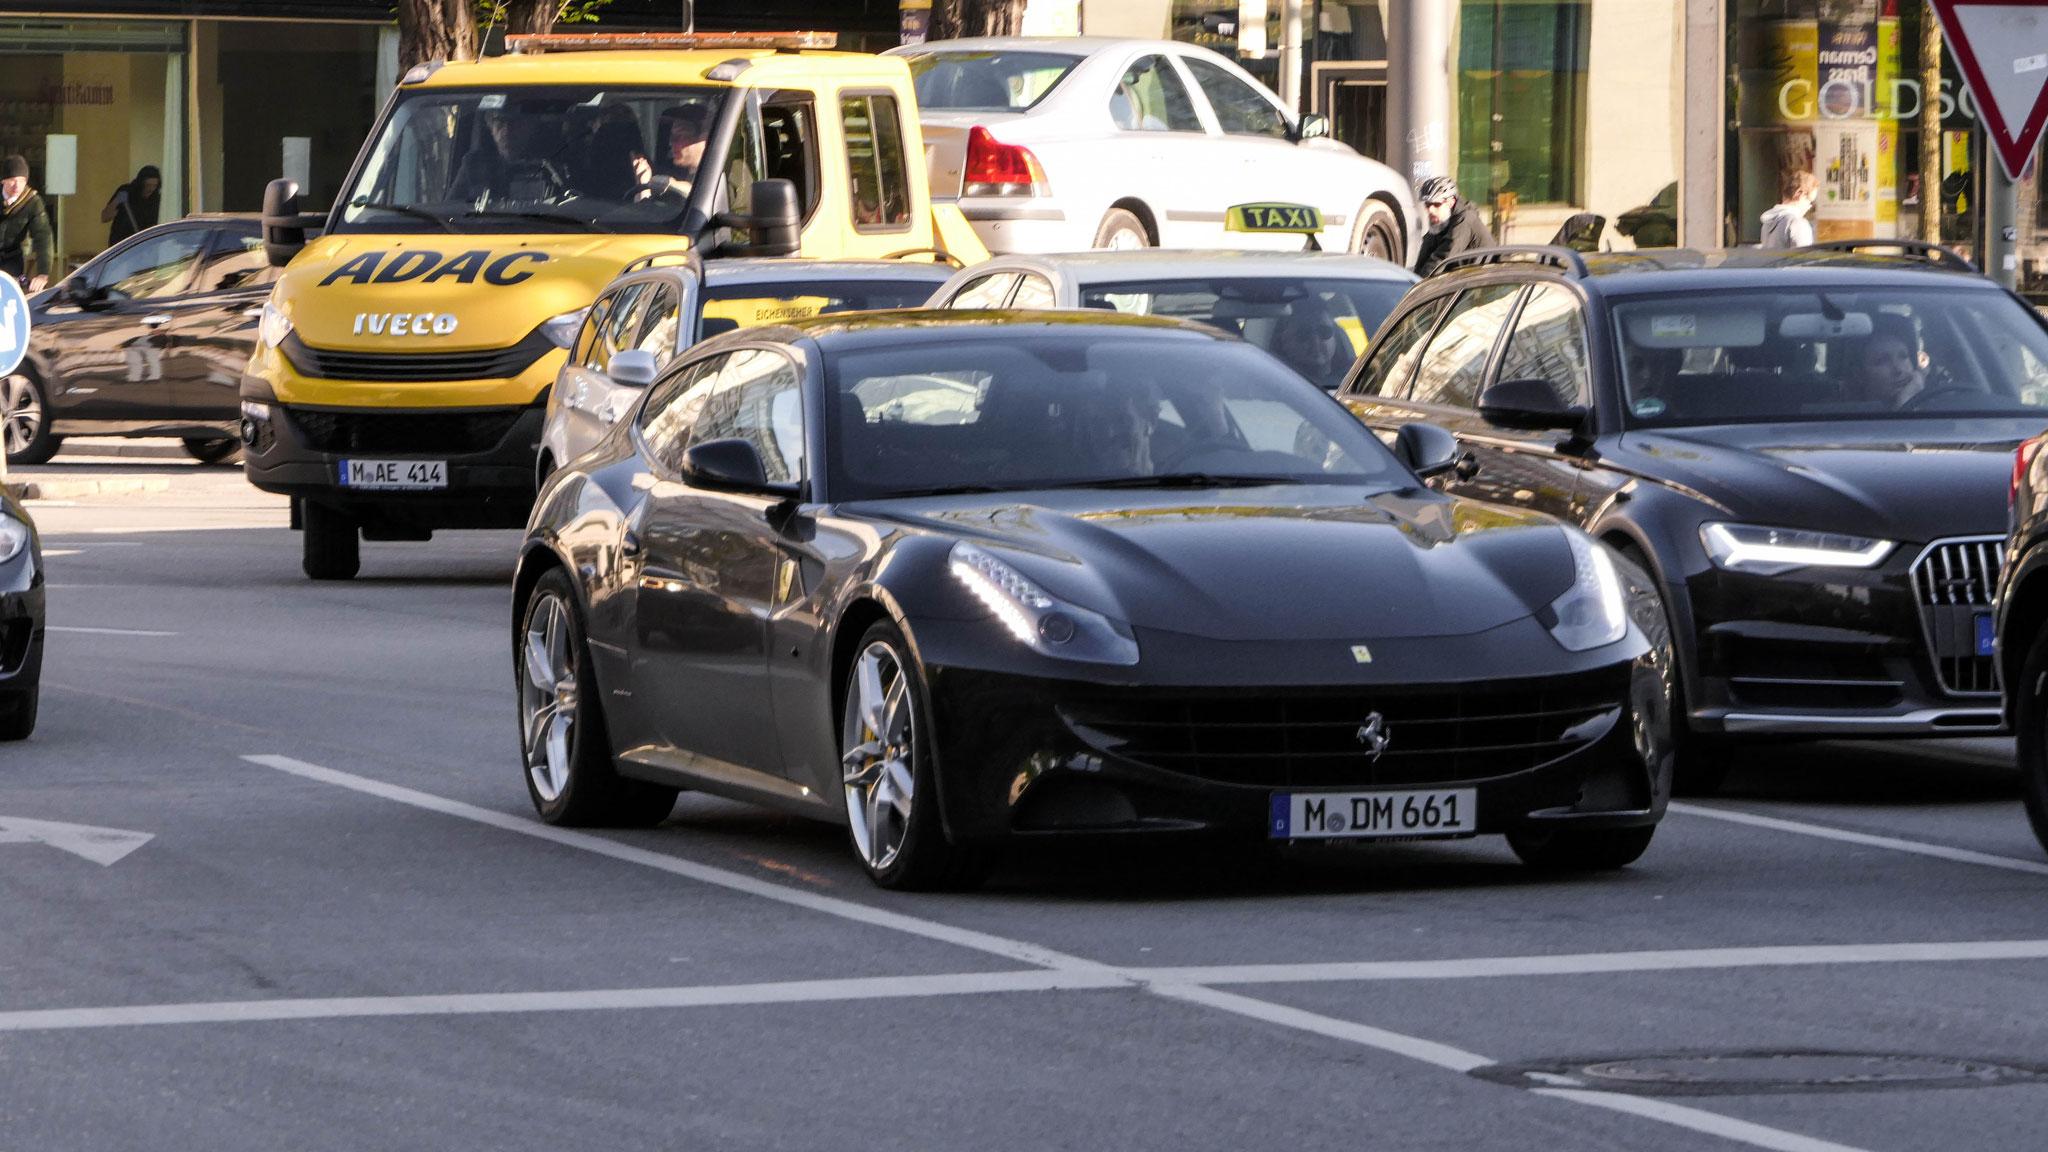 Ferrari FF - M-DM-661